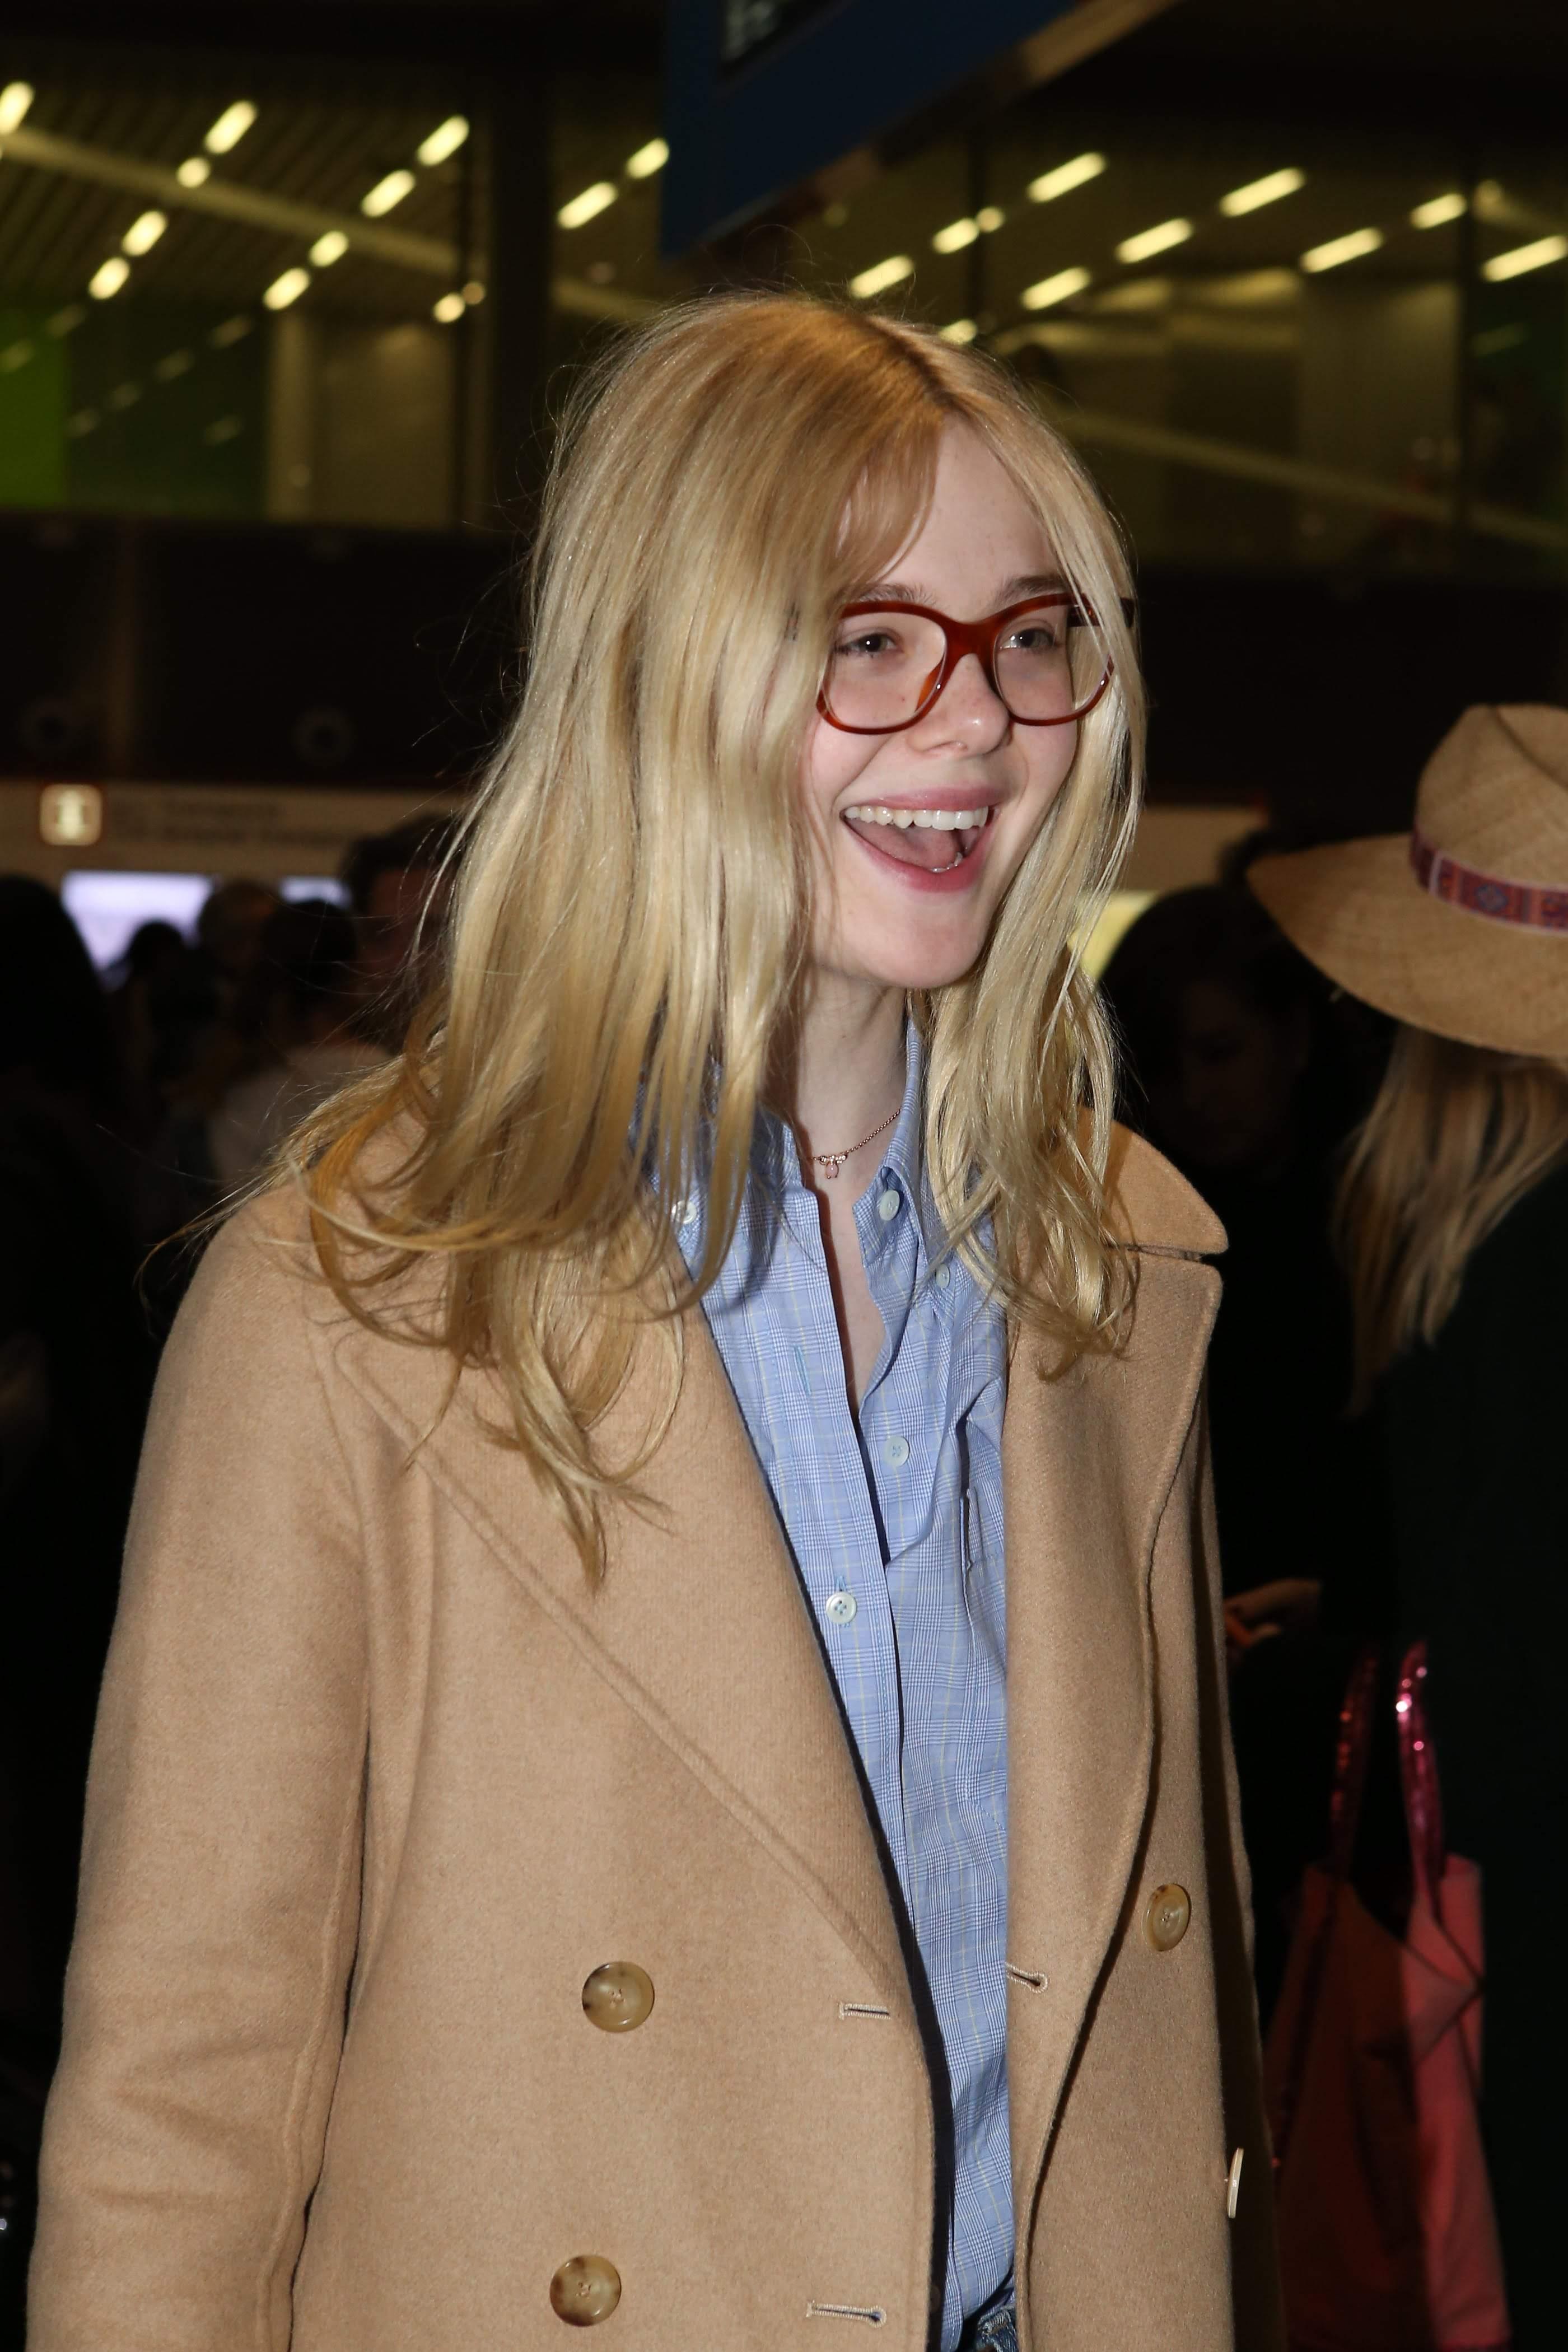 Elle Fanning touched down in Charles De Gaulle Airport : ファッション・ウィーク開催中のパリのシャルル・ド・ゴール空港に到着のエルたん ! !